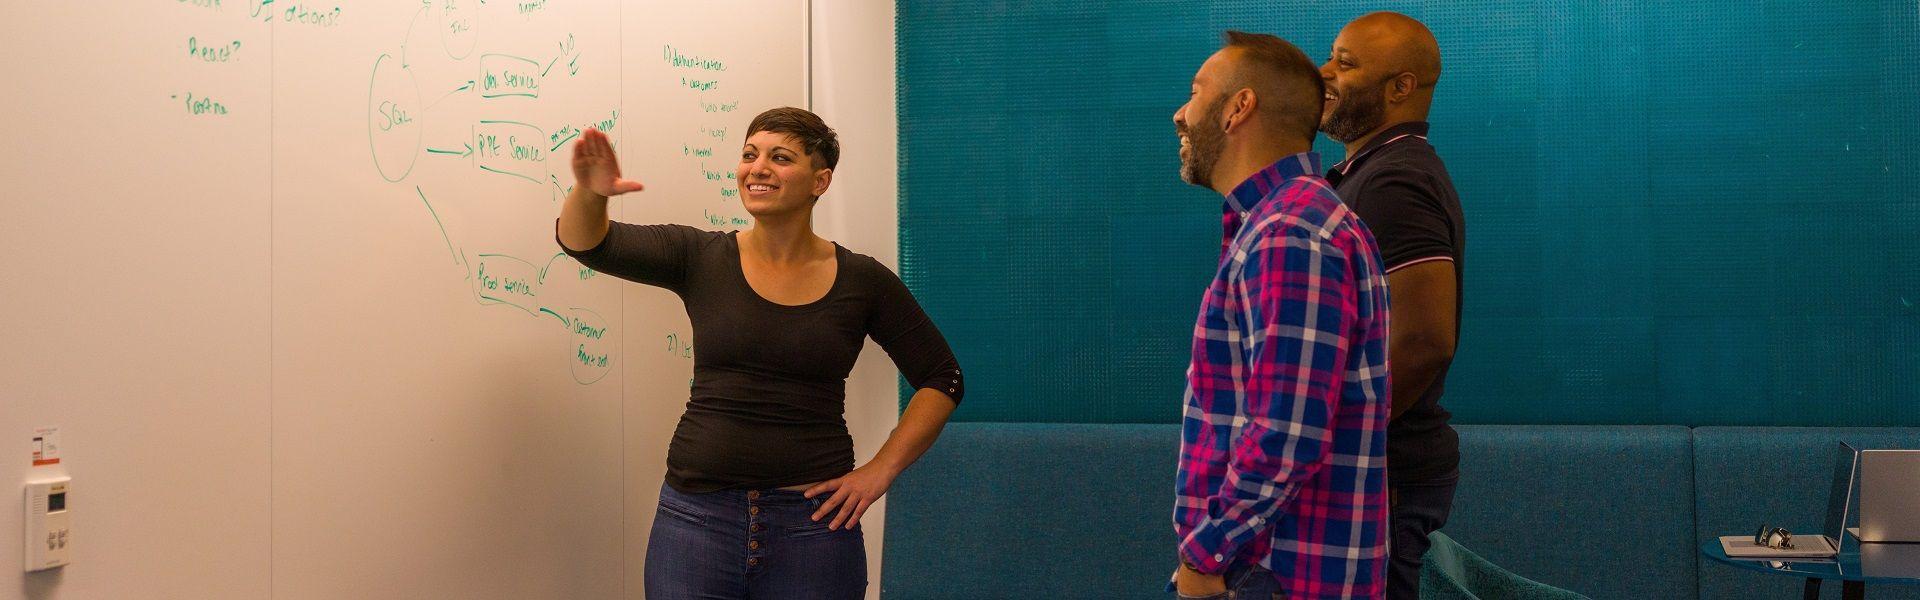 Photo of Microsoft employees at whiteboard